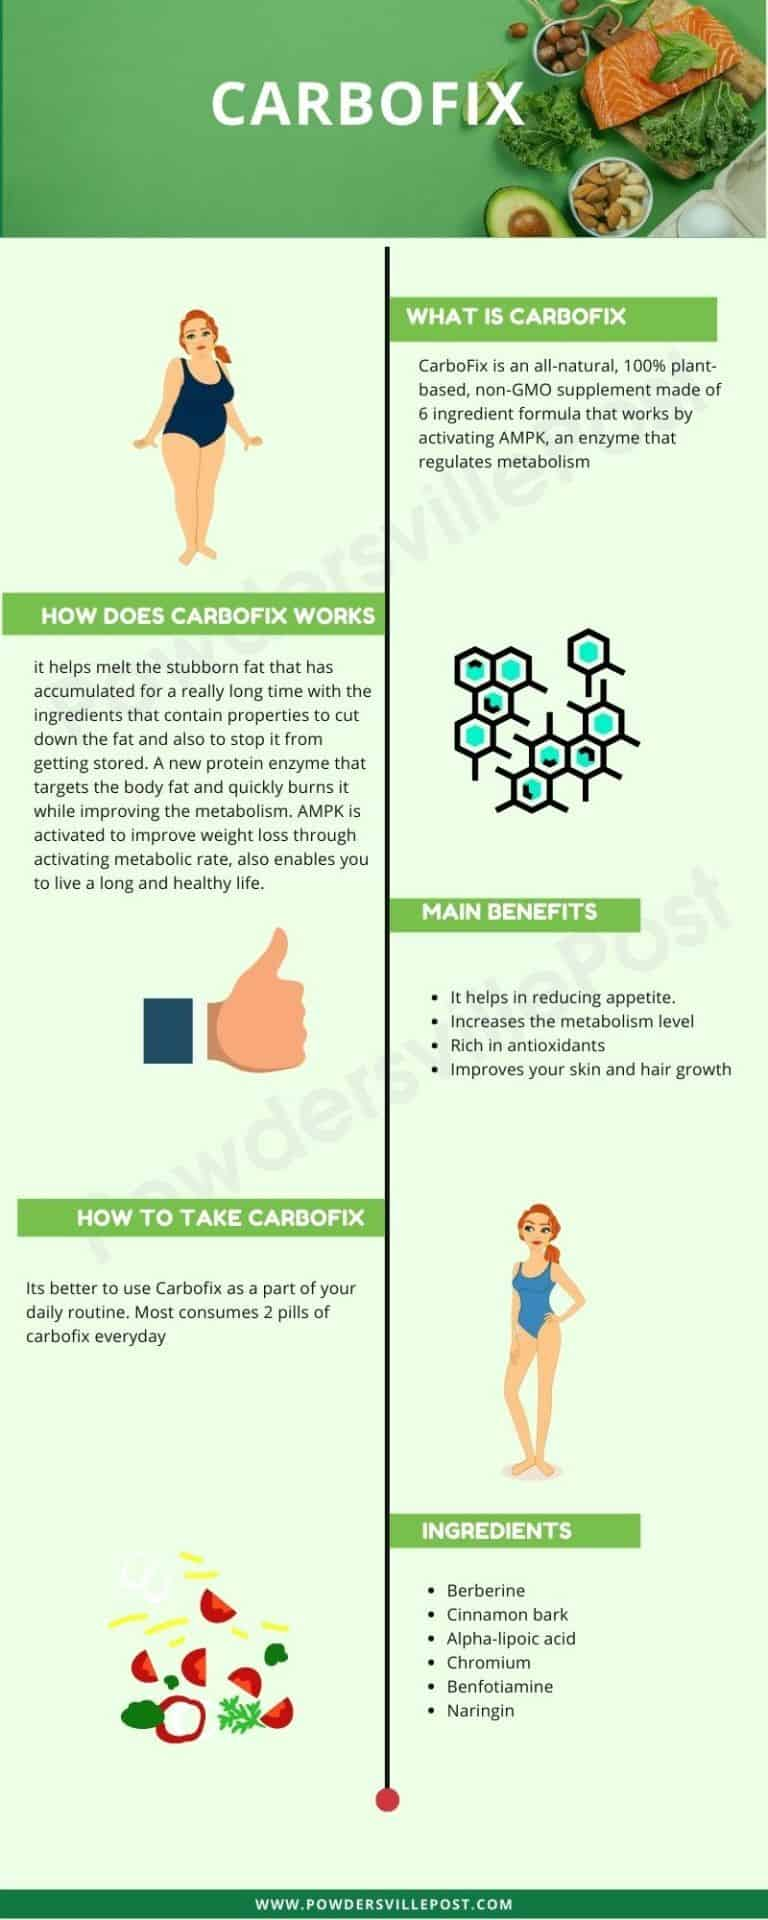 CarboFix - overview